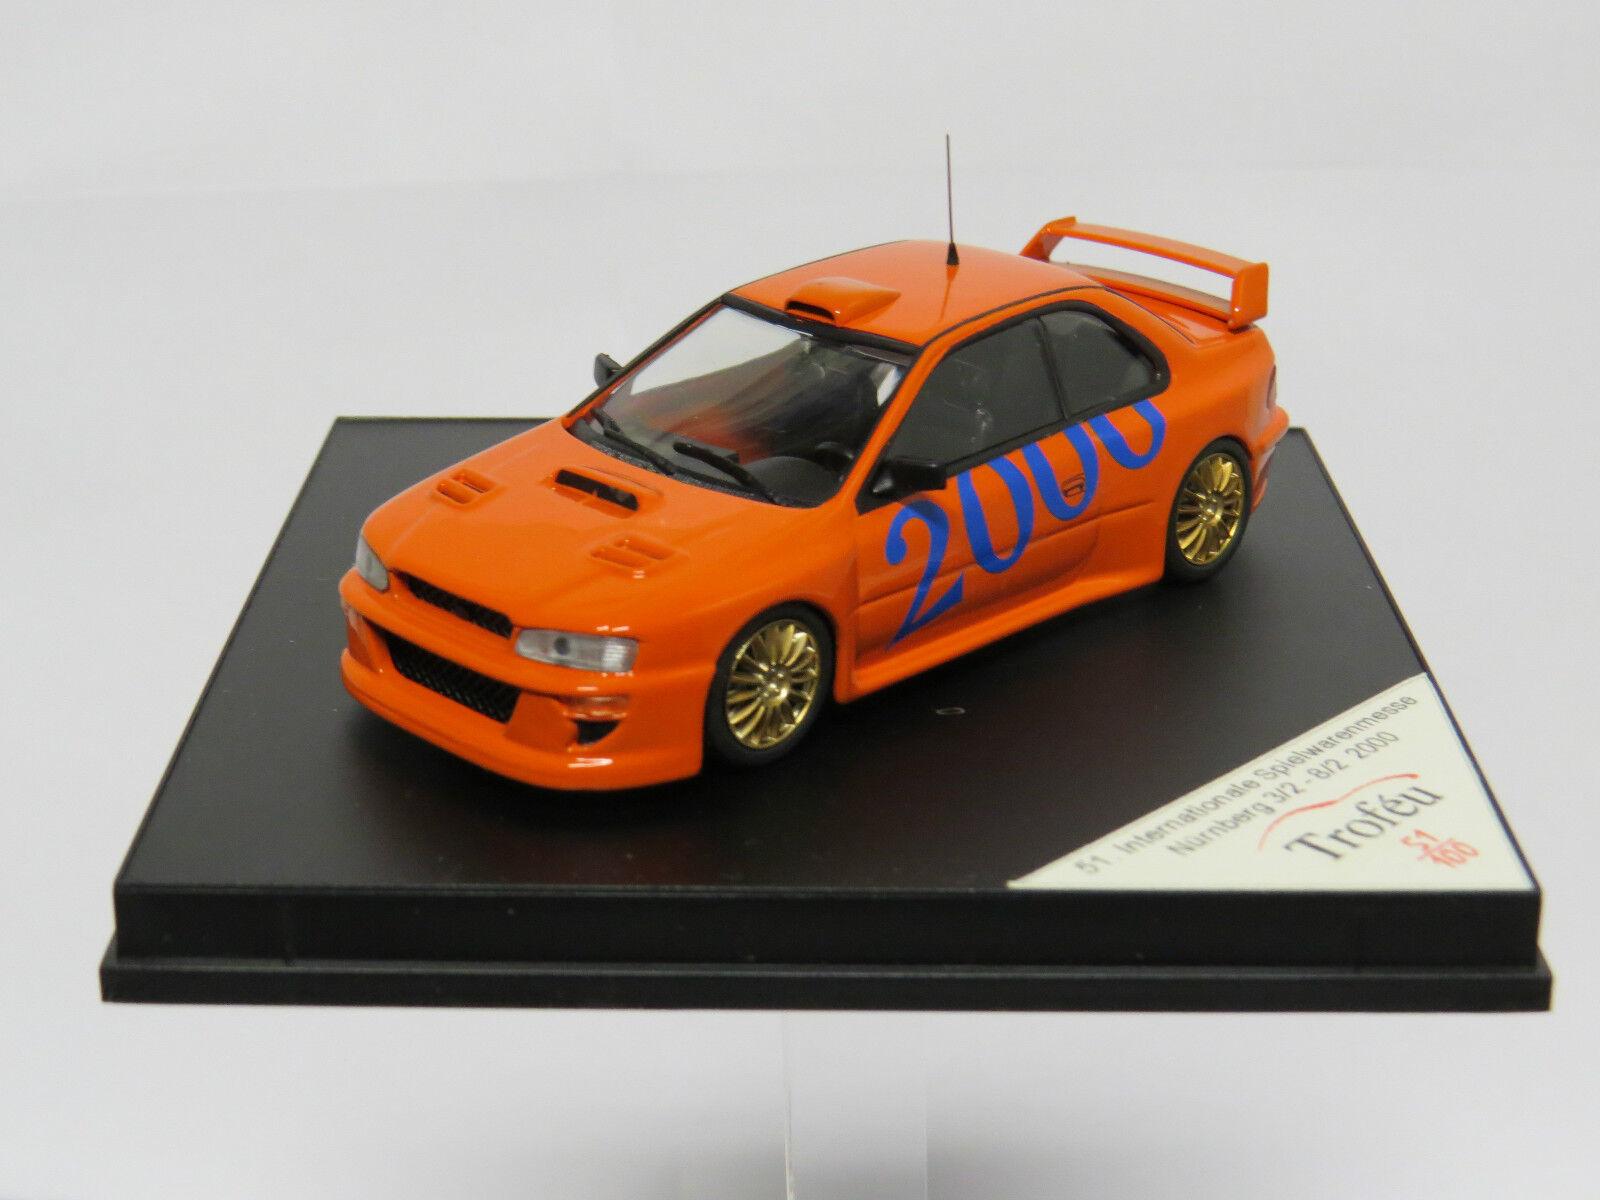 Subaru 51ste Inter Spielwarenmesse Nürnberg 2000 1 43 Troféu  51 100 limited  les promotions